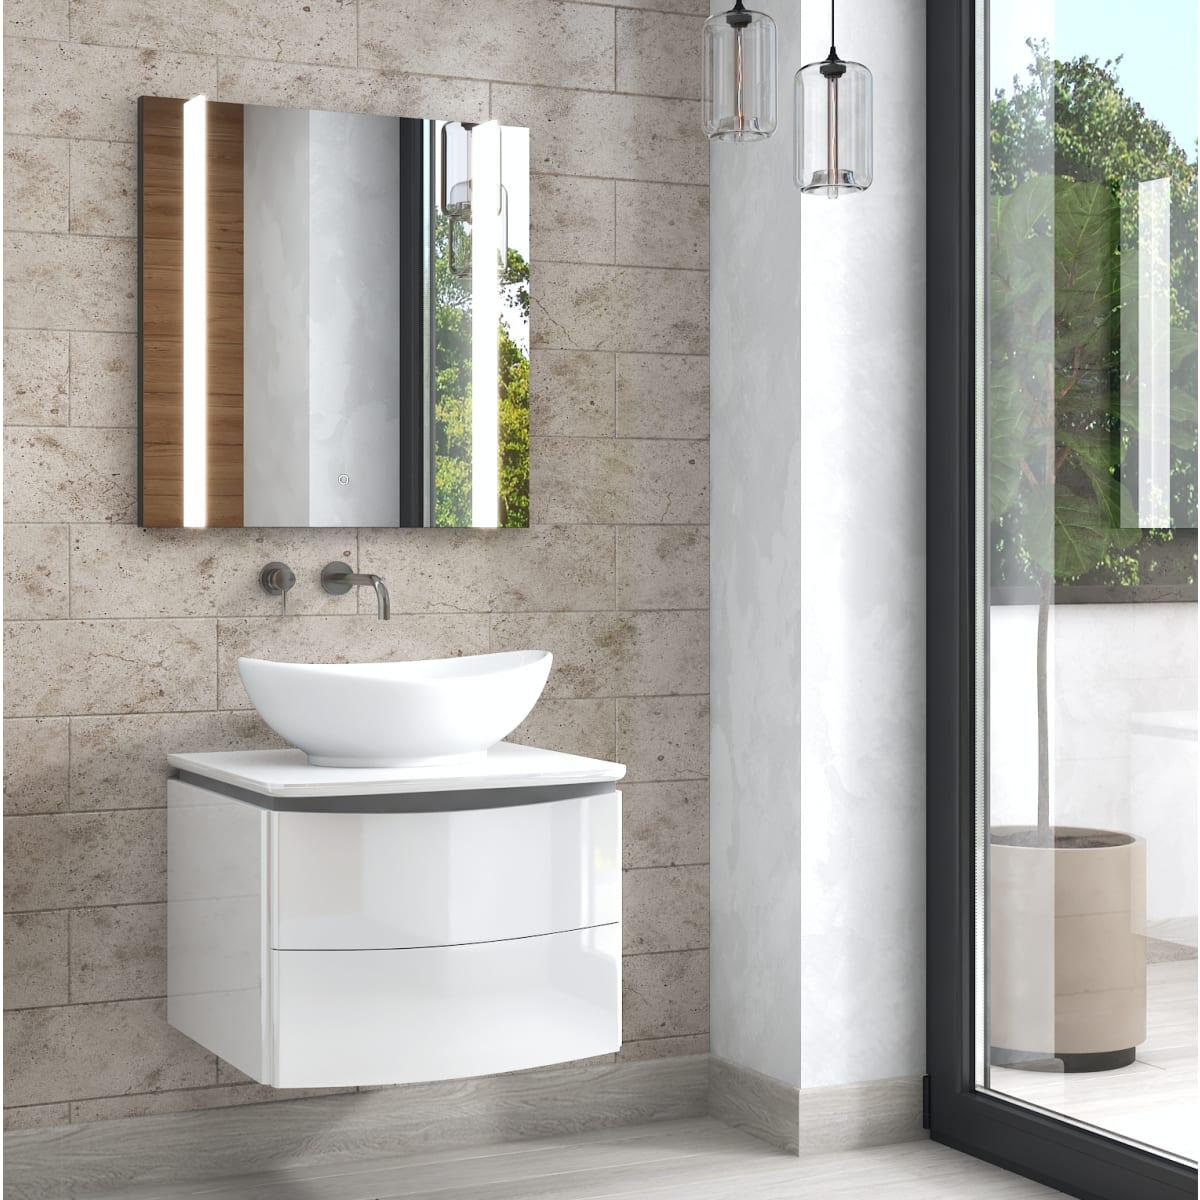 Зеркало Land с подсветкой 70x70 см